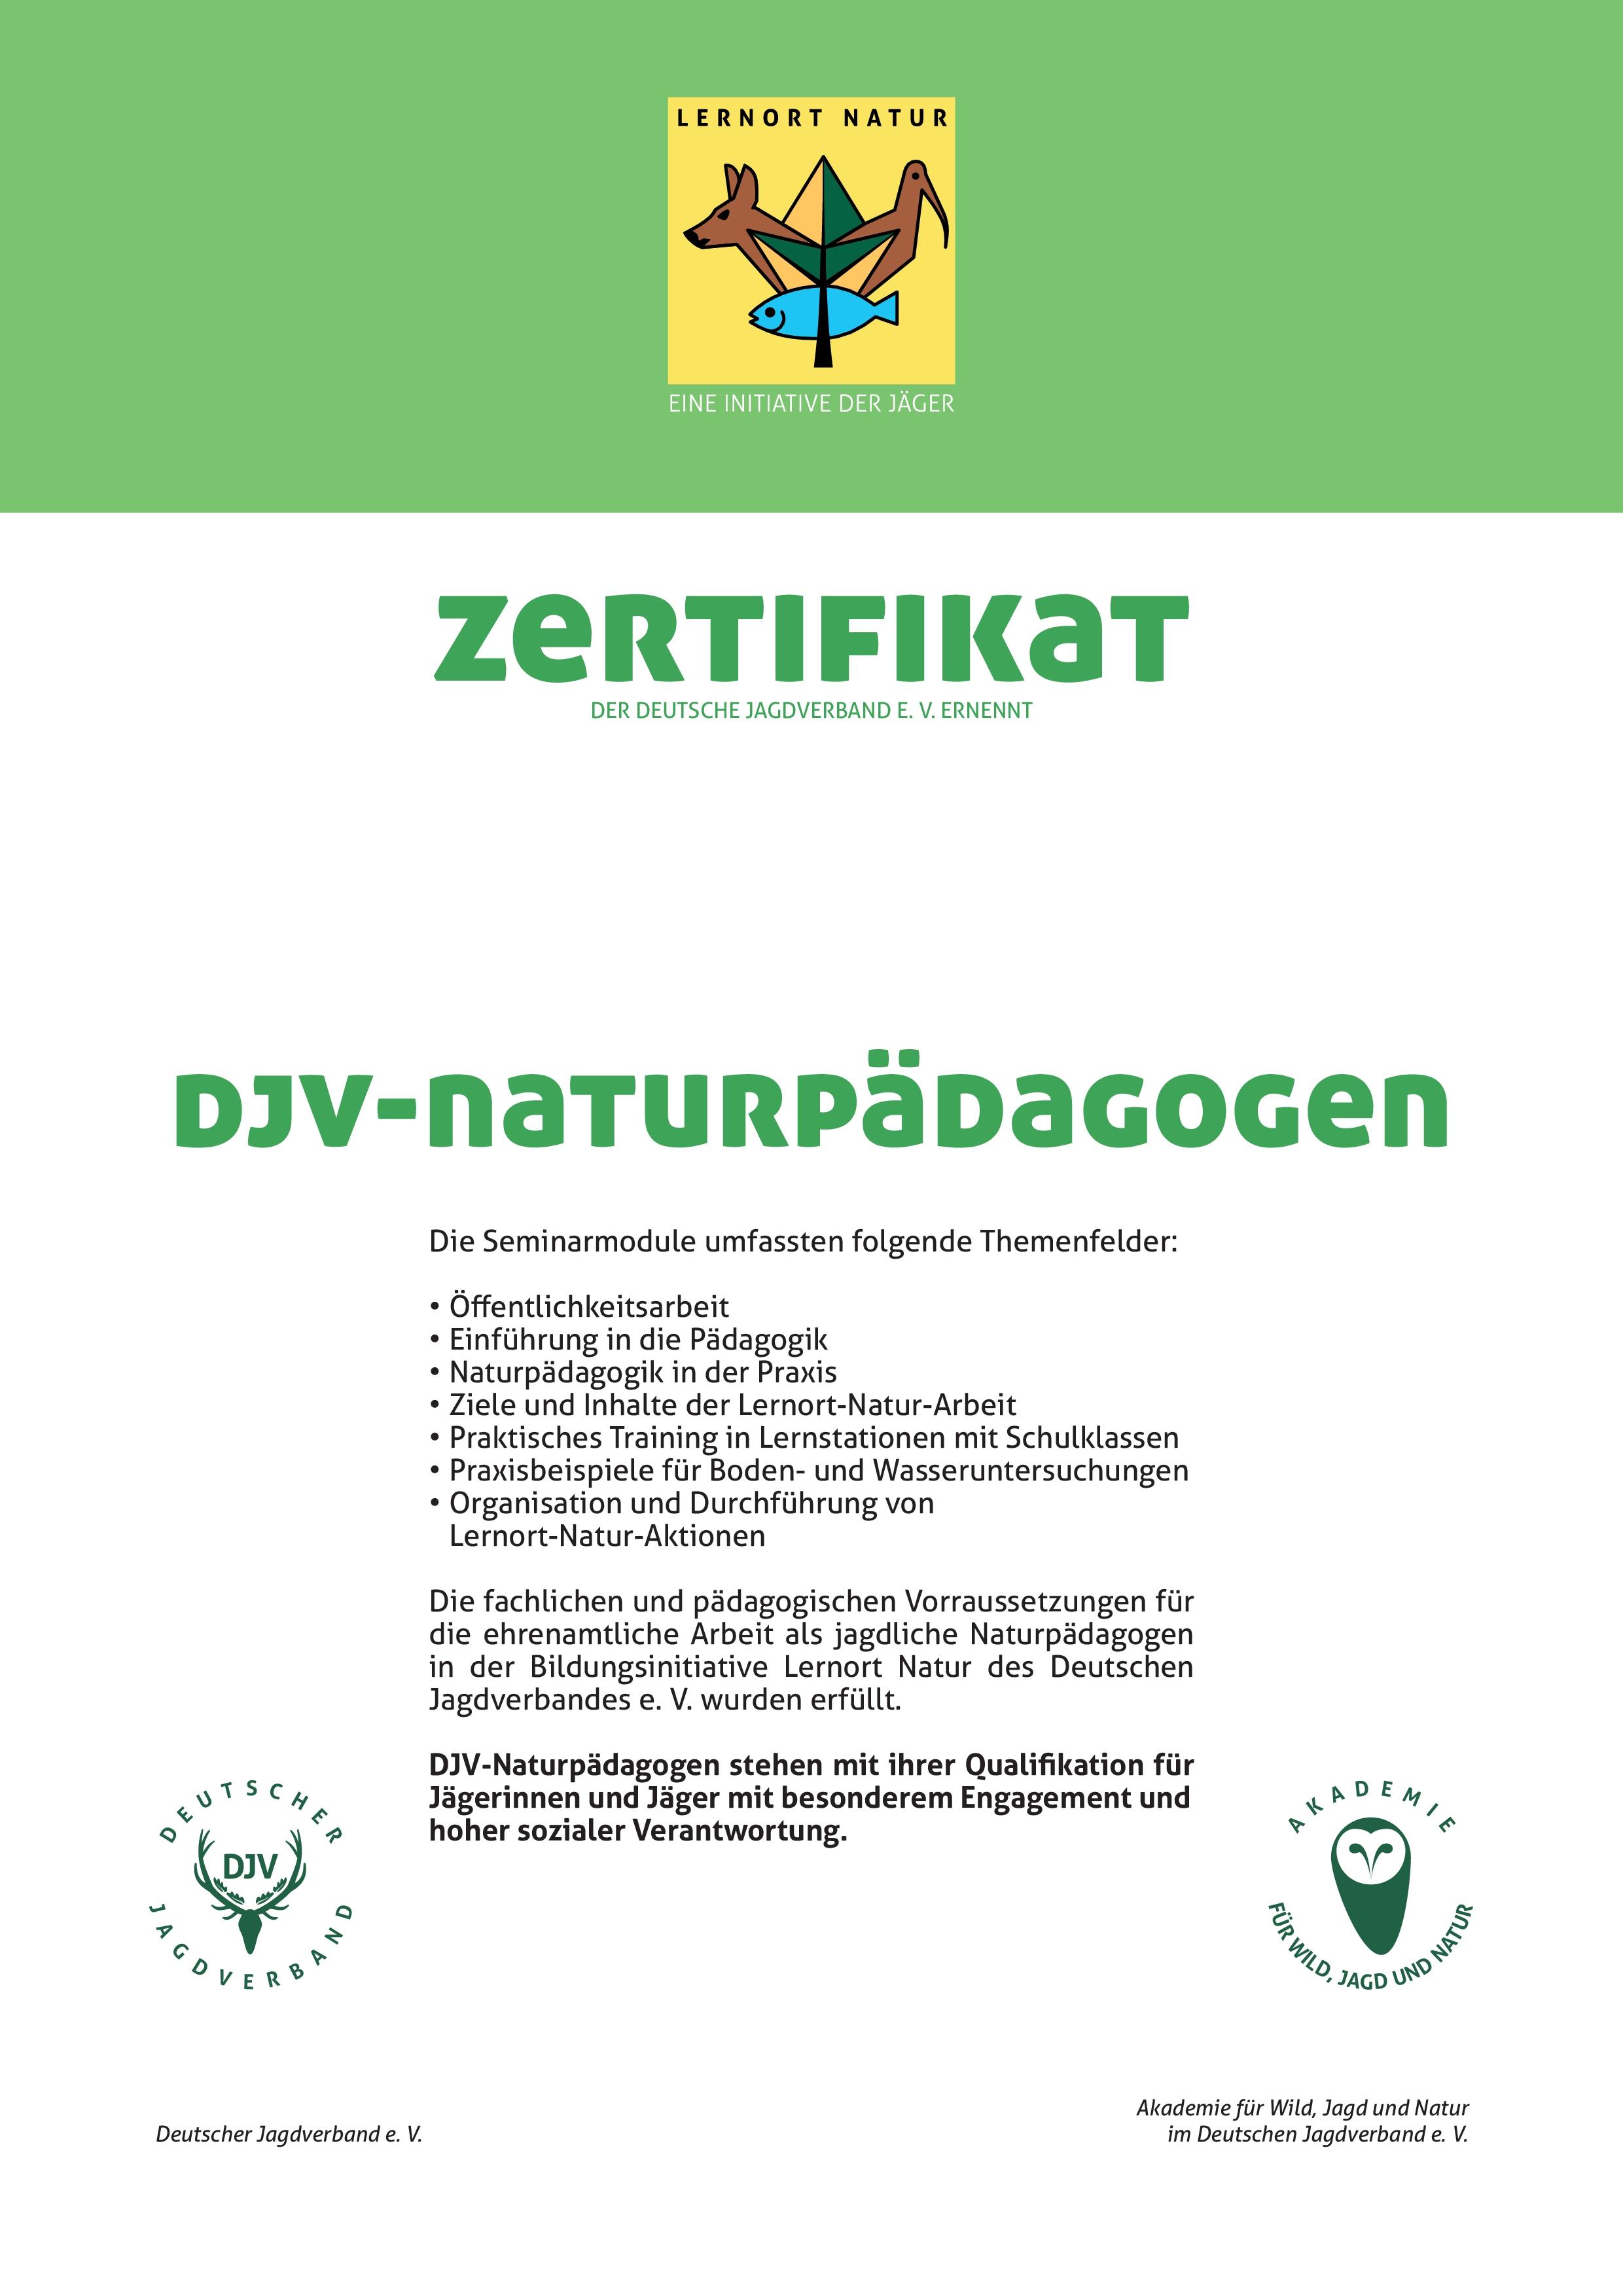 Zertifikat DJV Naturpädagoge